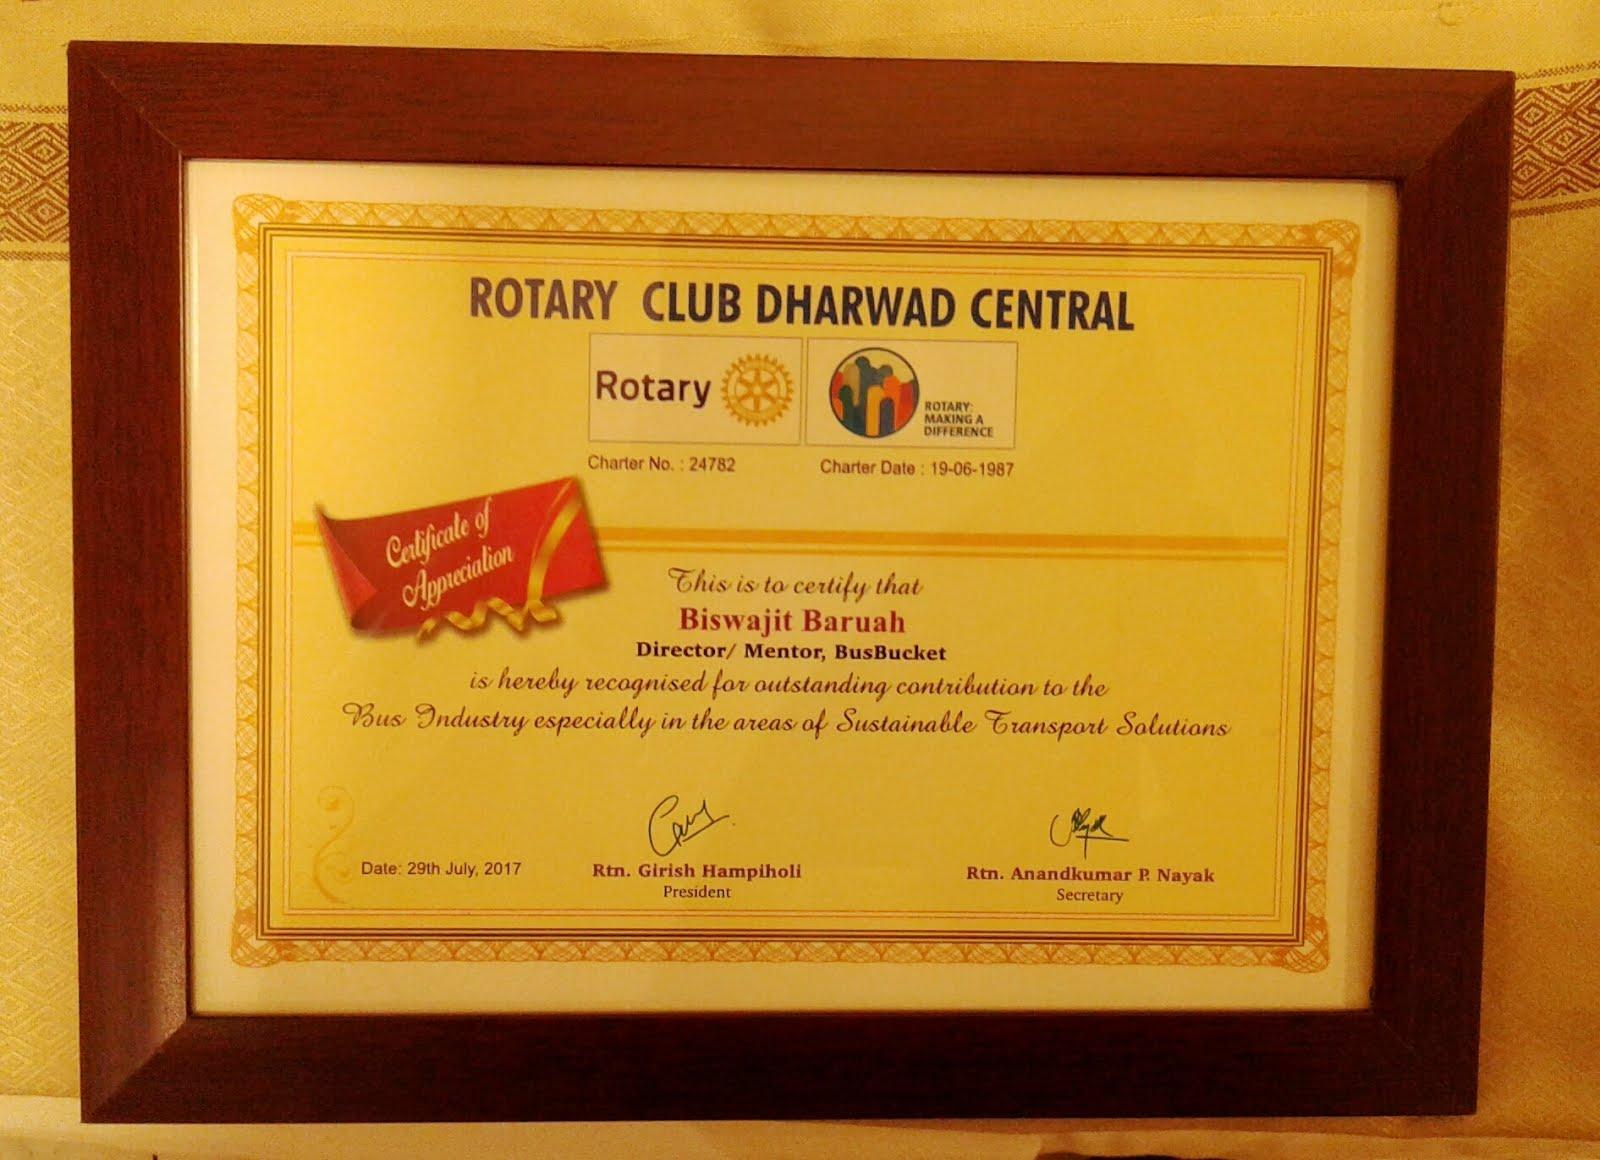 Felicitation by Rotary Club of Dharwad Central, Karnataka